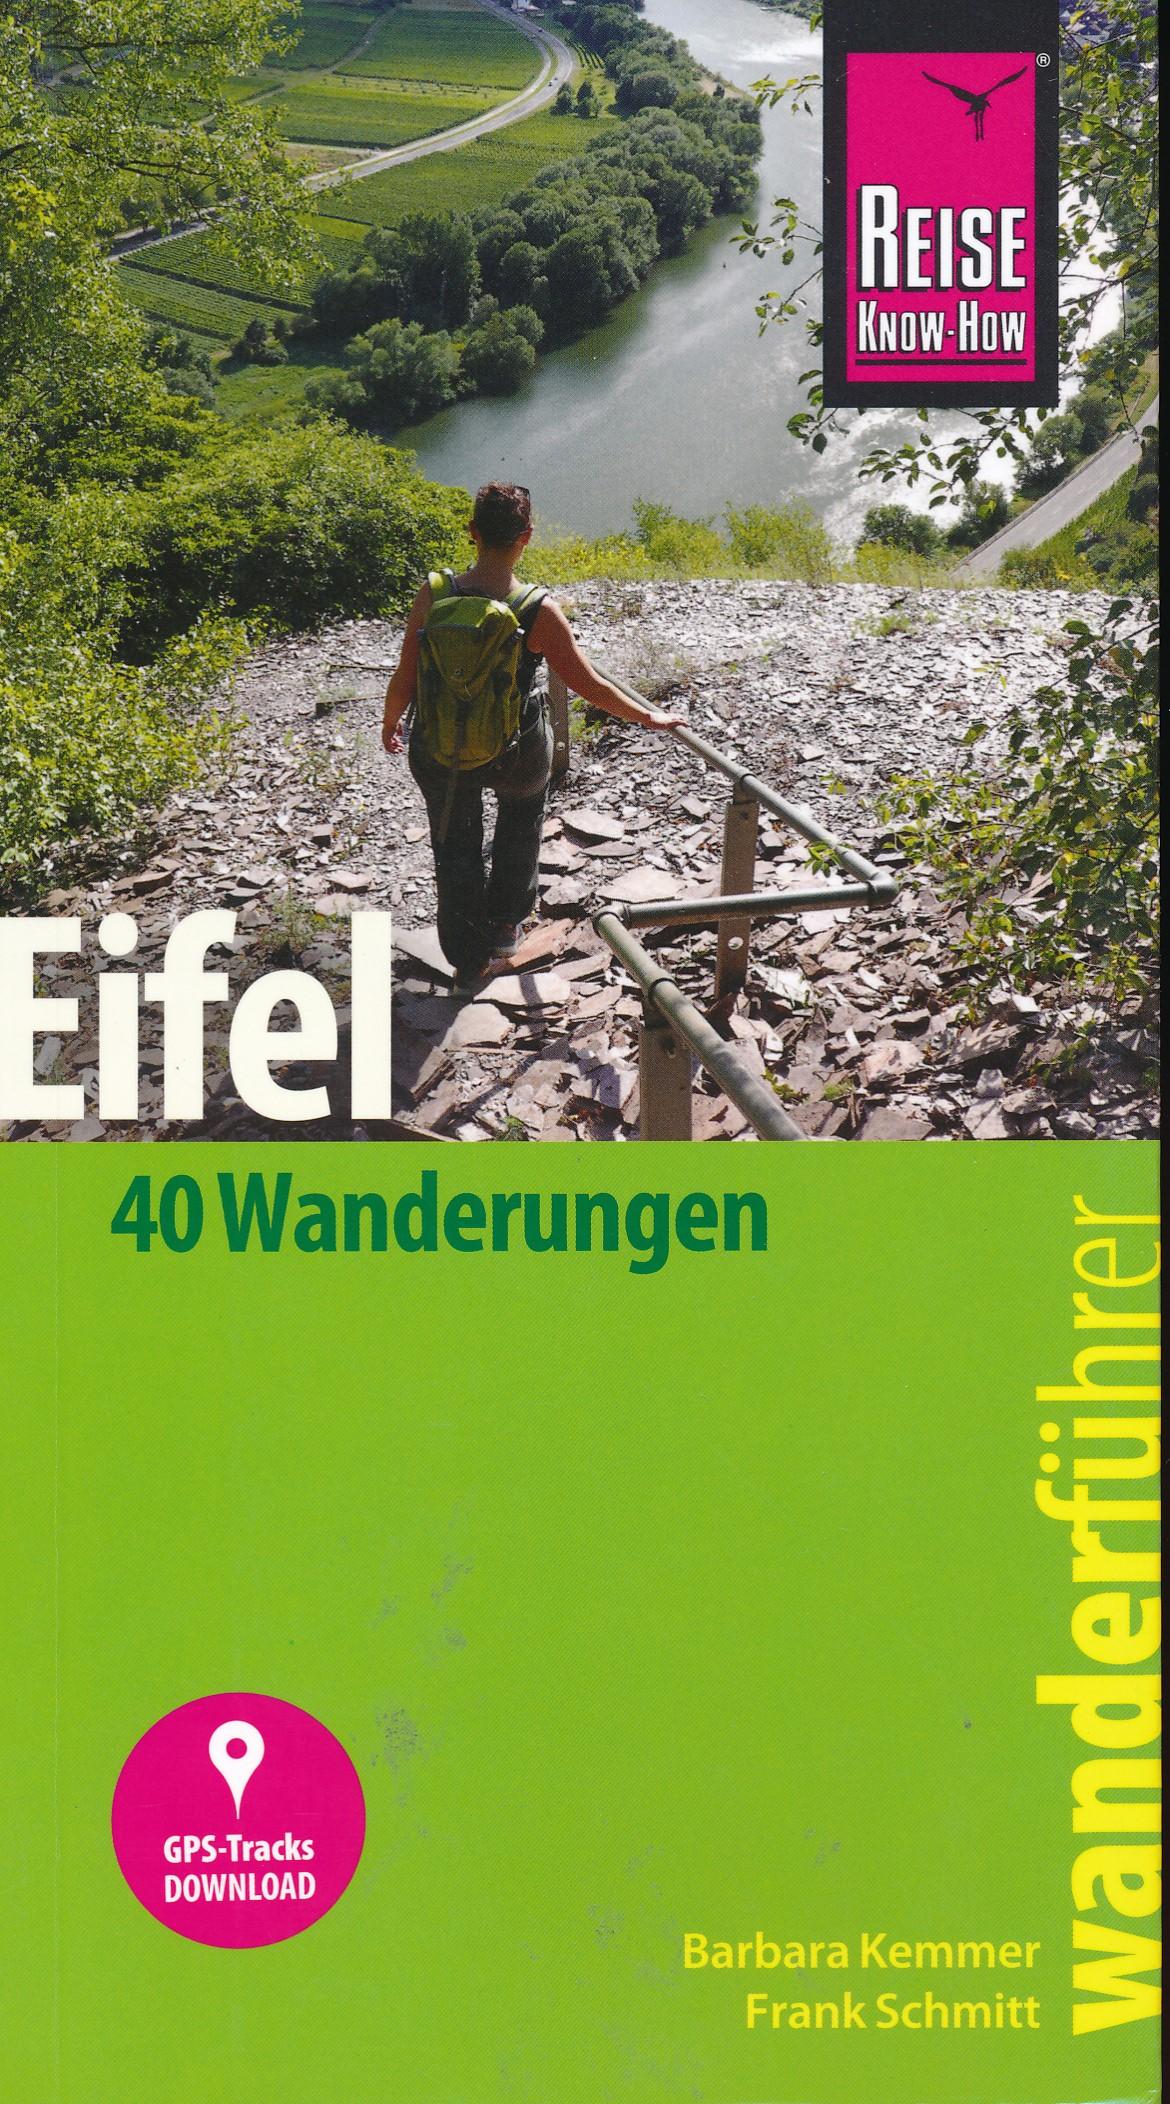 Wandelgids Eifel | Reise Know-How Verlag de zwerver